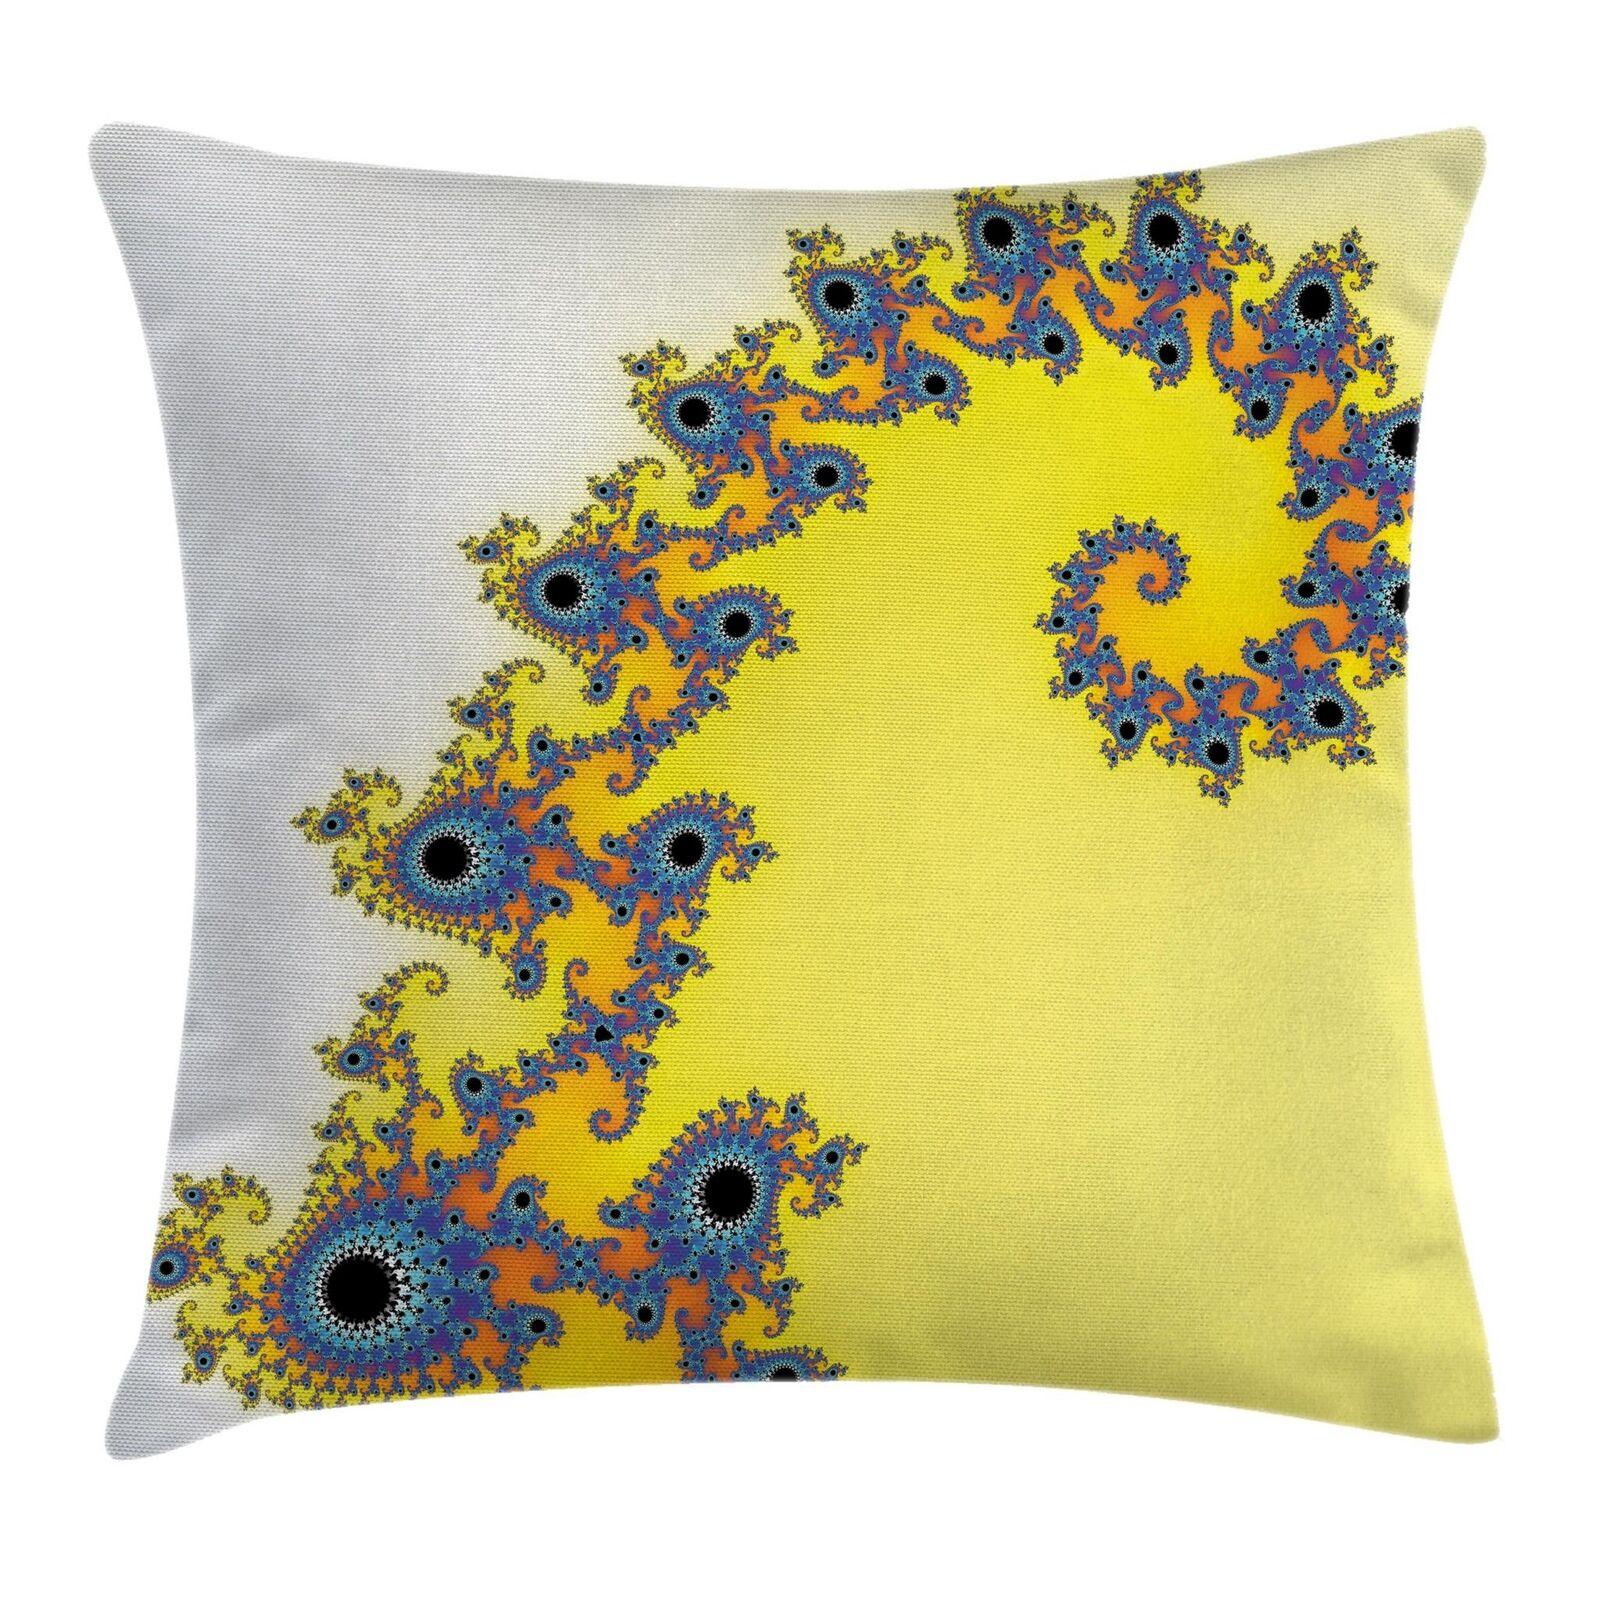 East Urban Home Floral Symmetrical Fractal Pattern Pillow For Sale Online Ebay